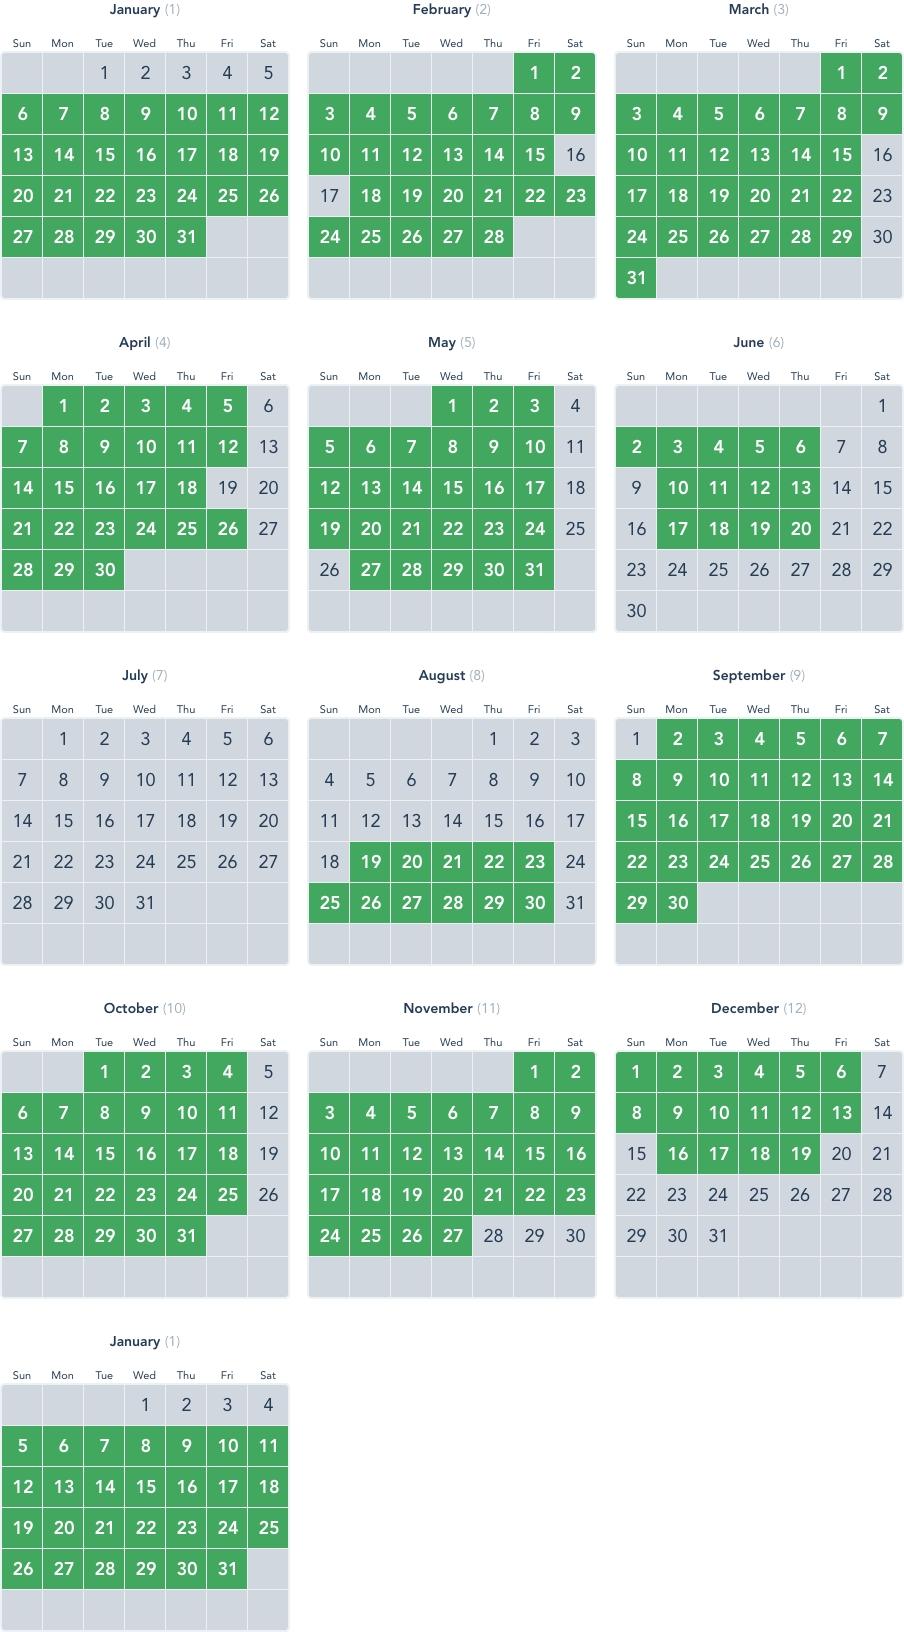 Disneyland Annual Pass Calendar